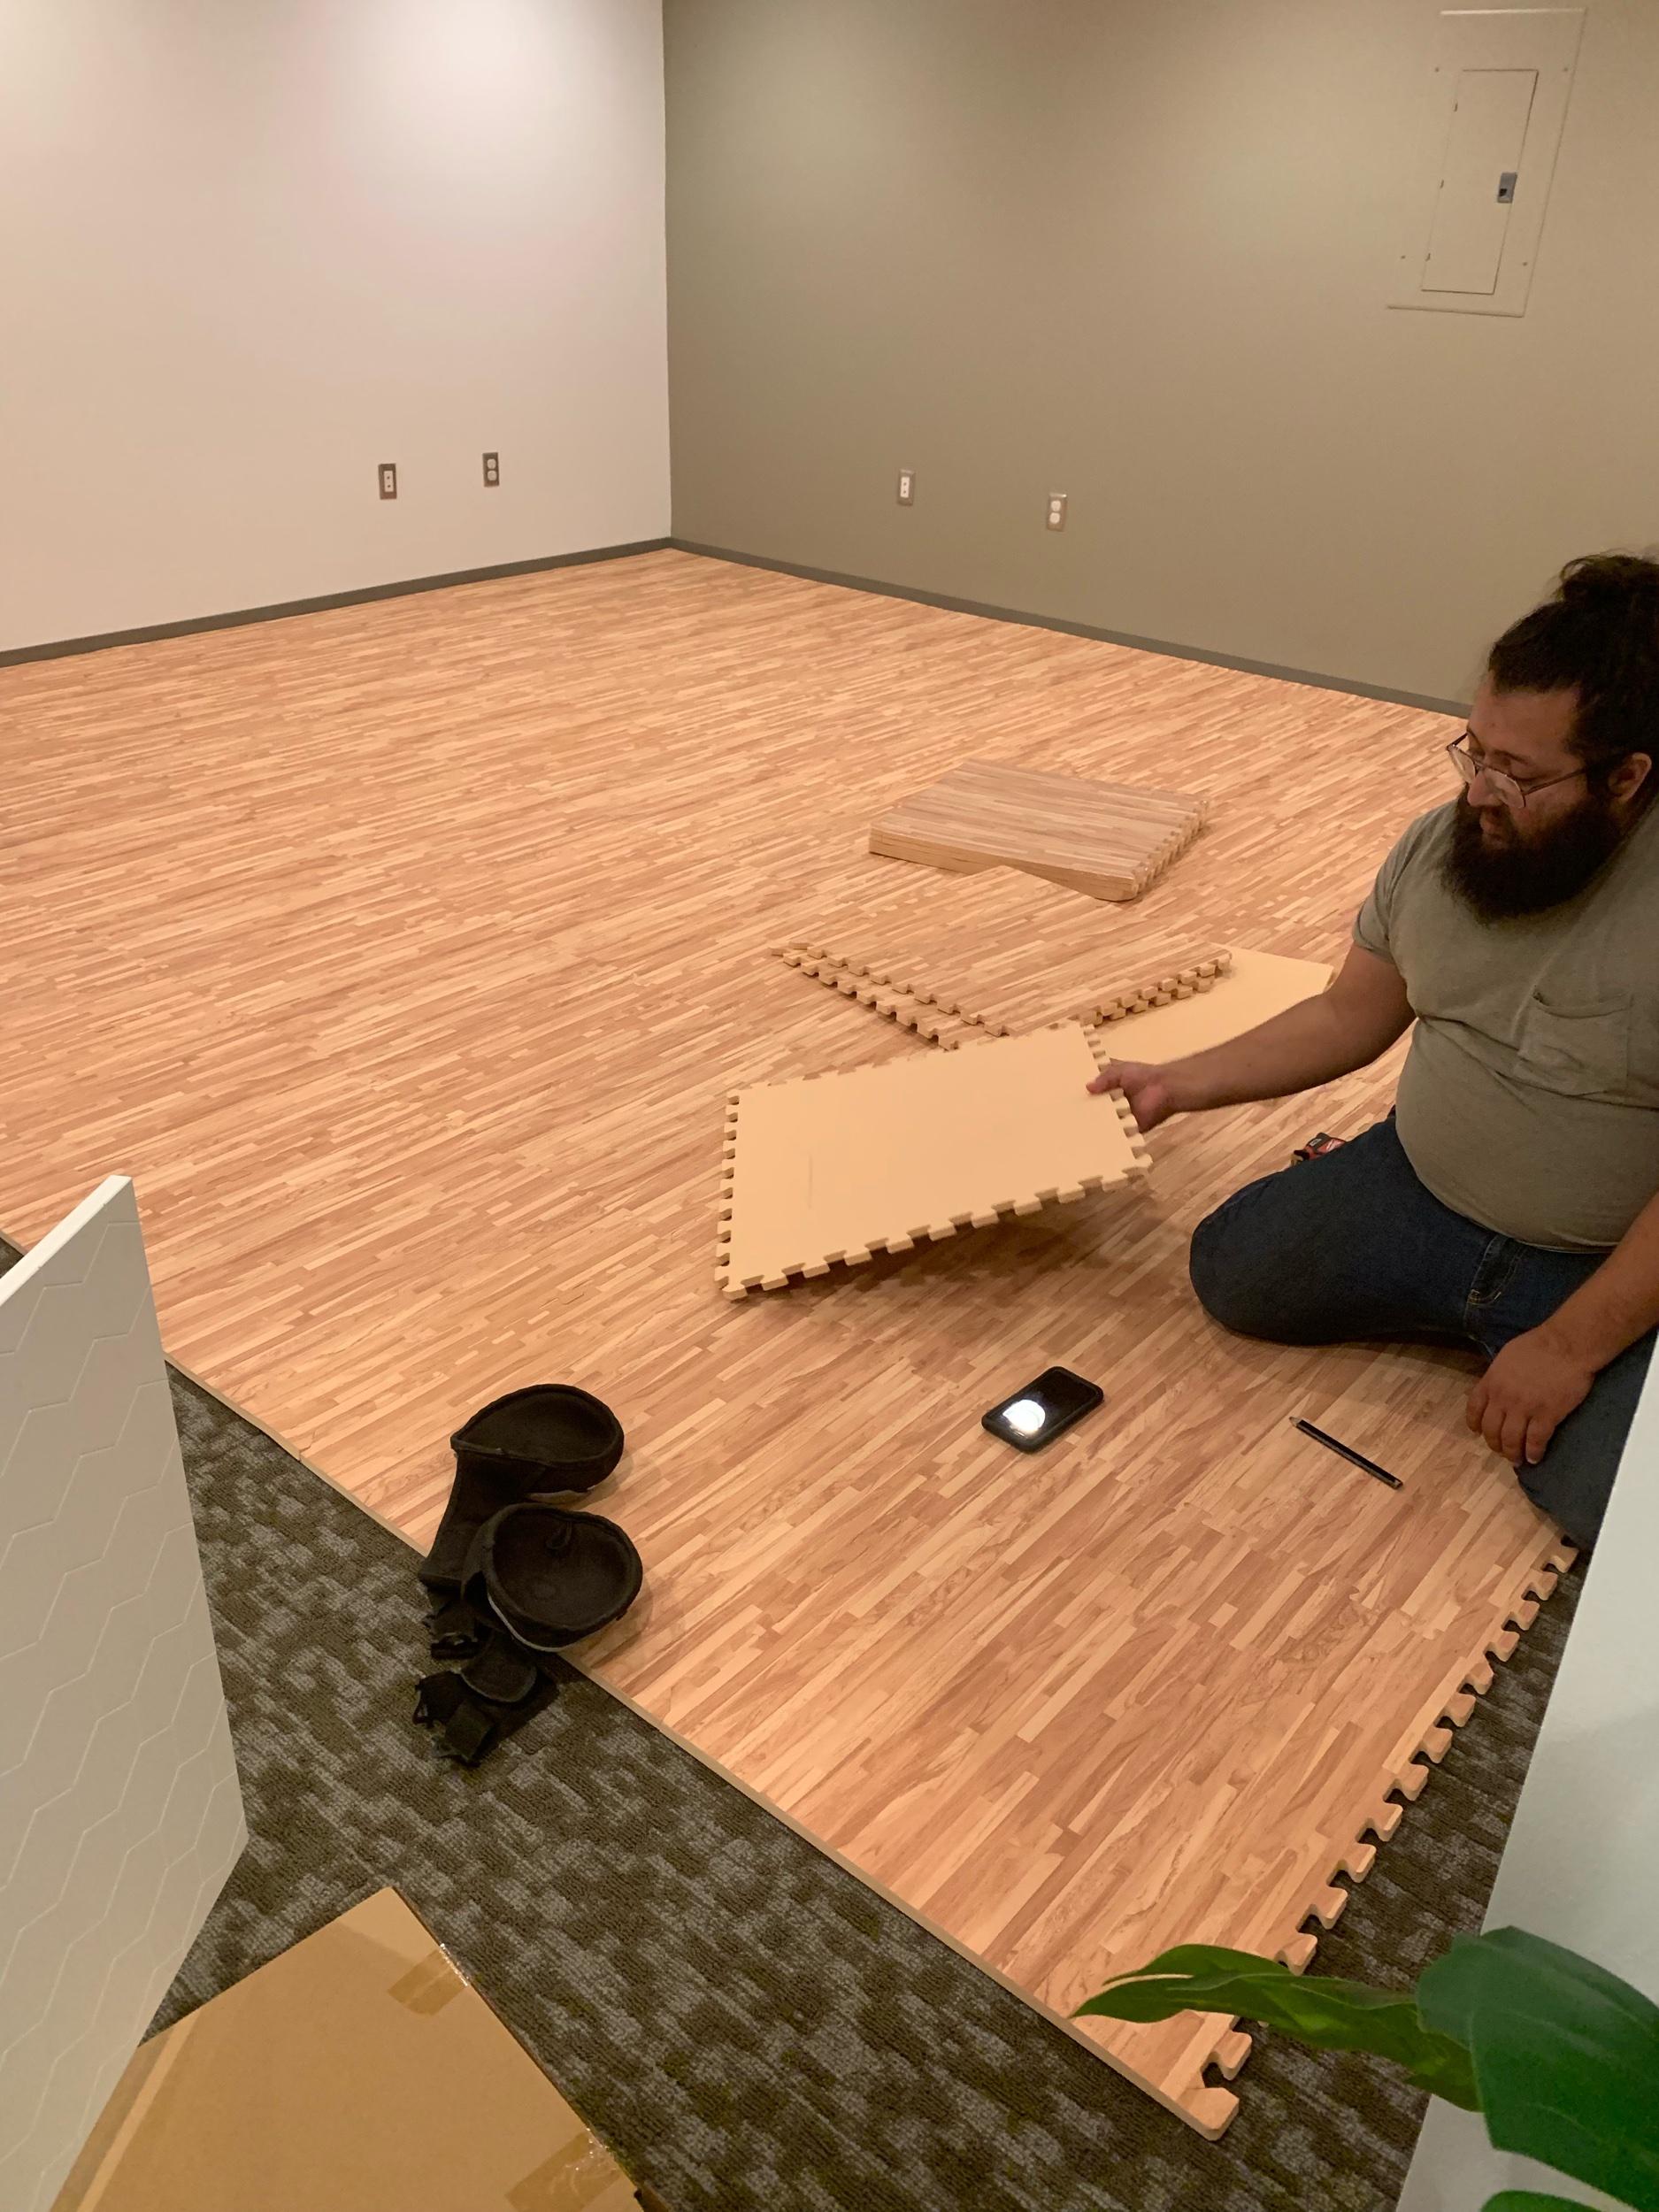 Most Comfortable Floor EVER